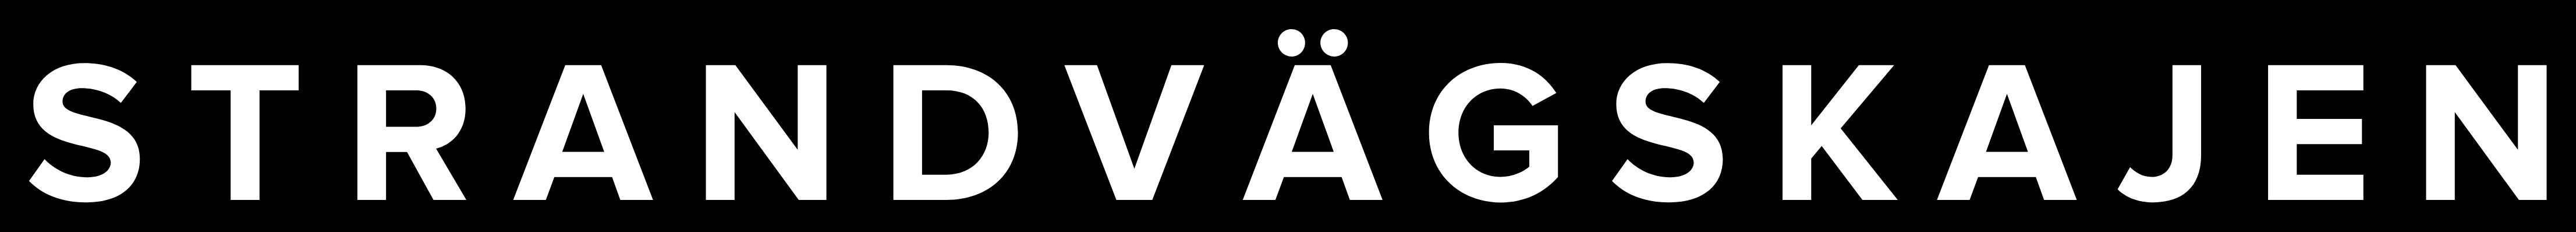 Logo Strandvägskajen - @strandvagskajen - strandvagskajen.se